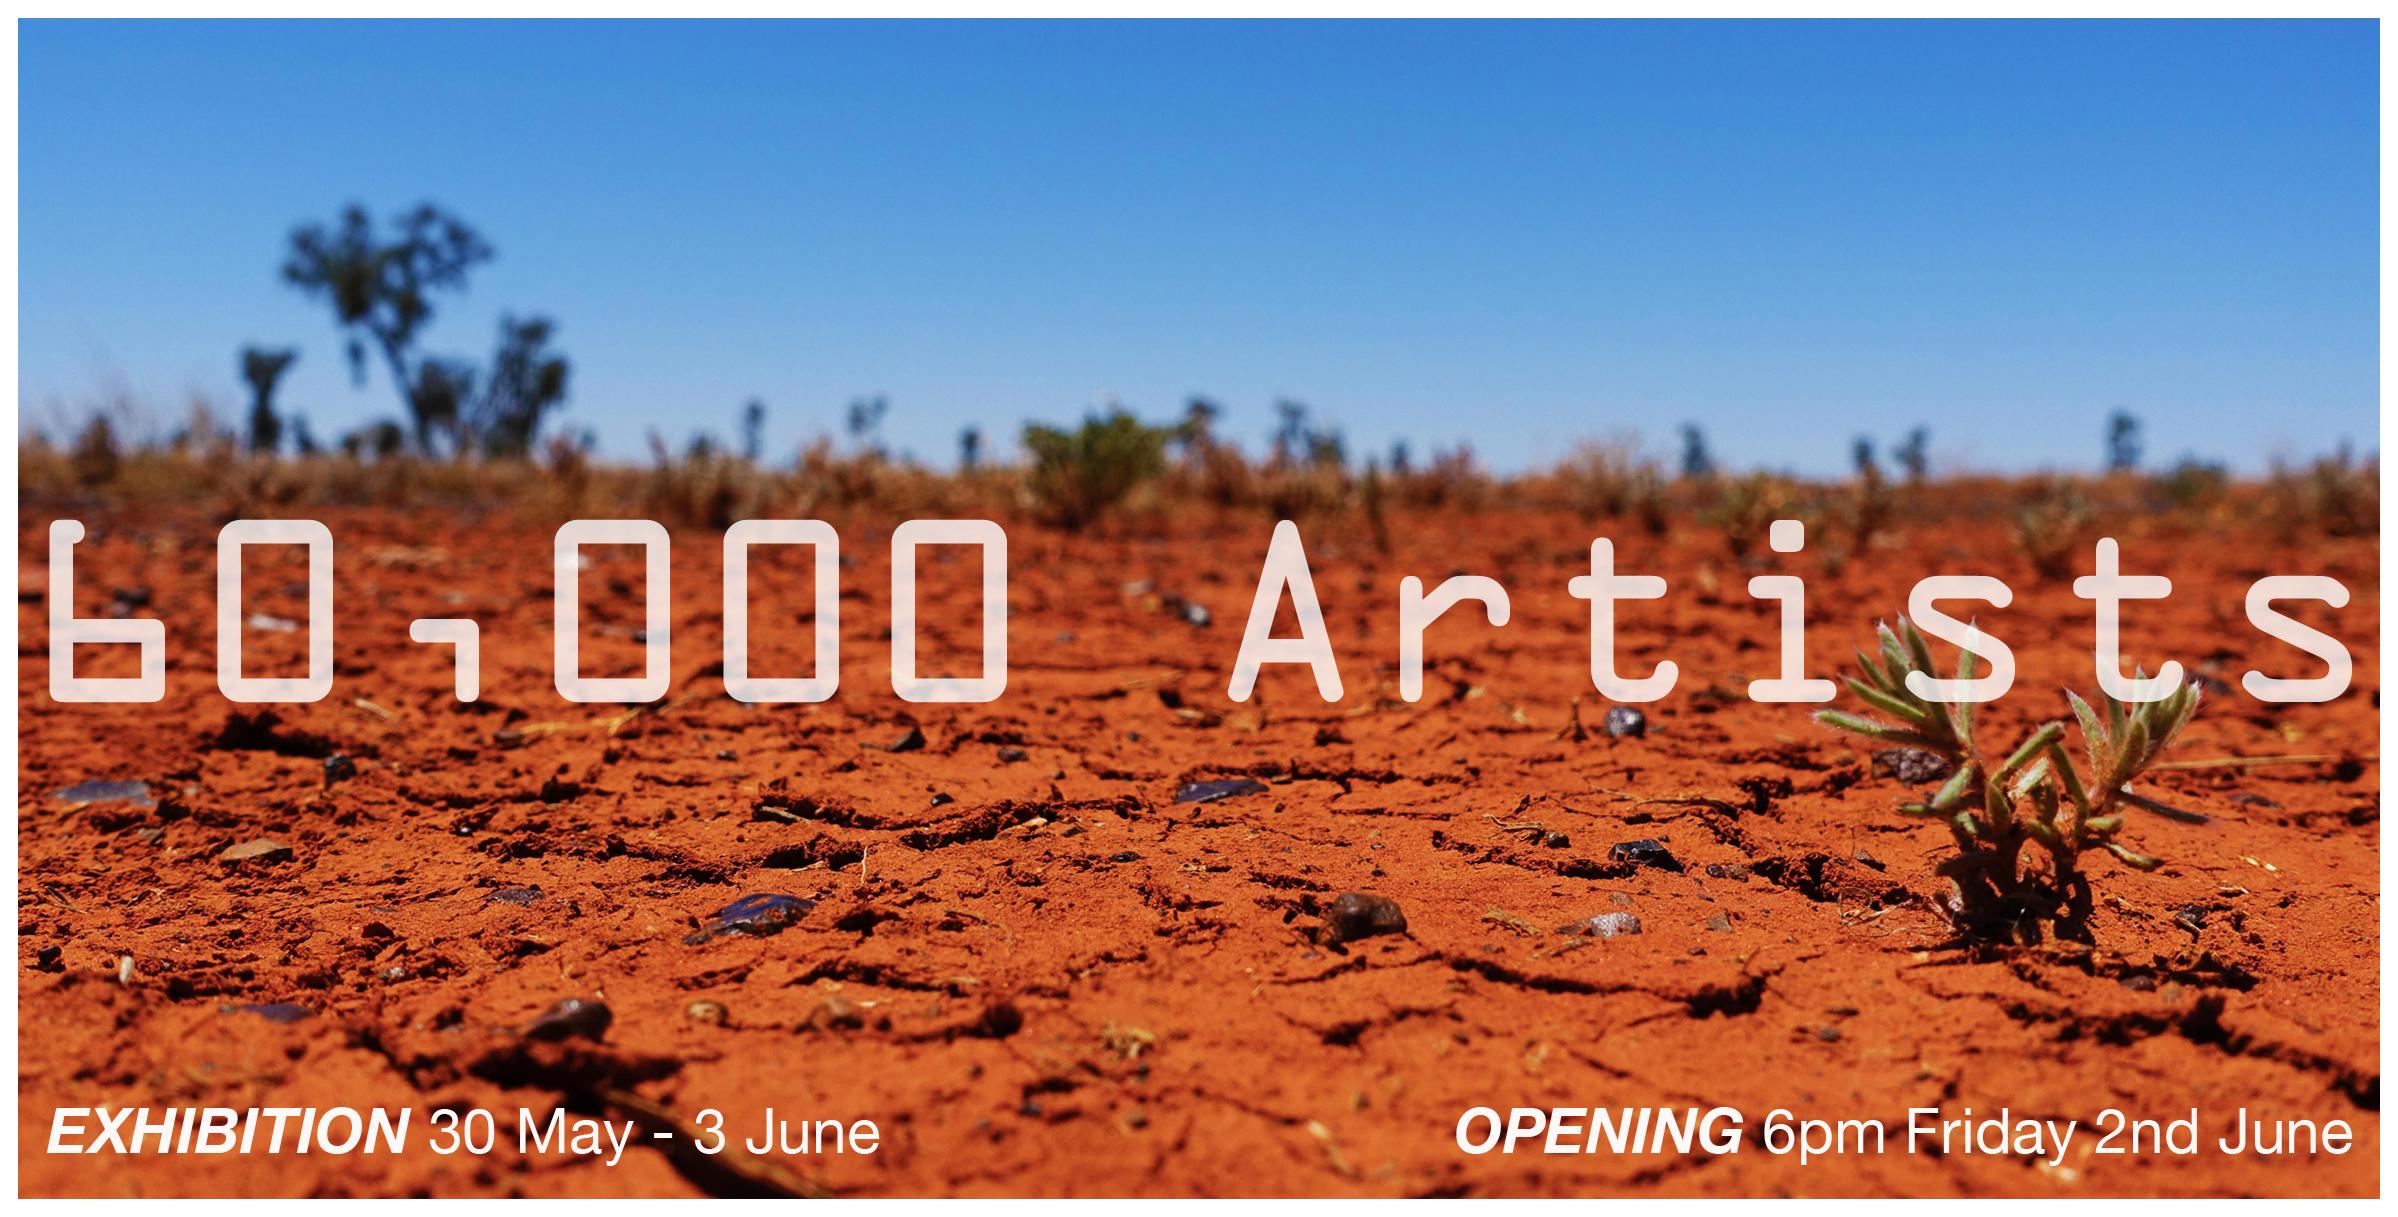 60000 artists-invite_front-bleed.jpg